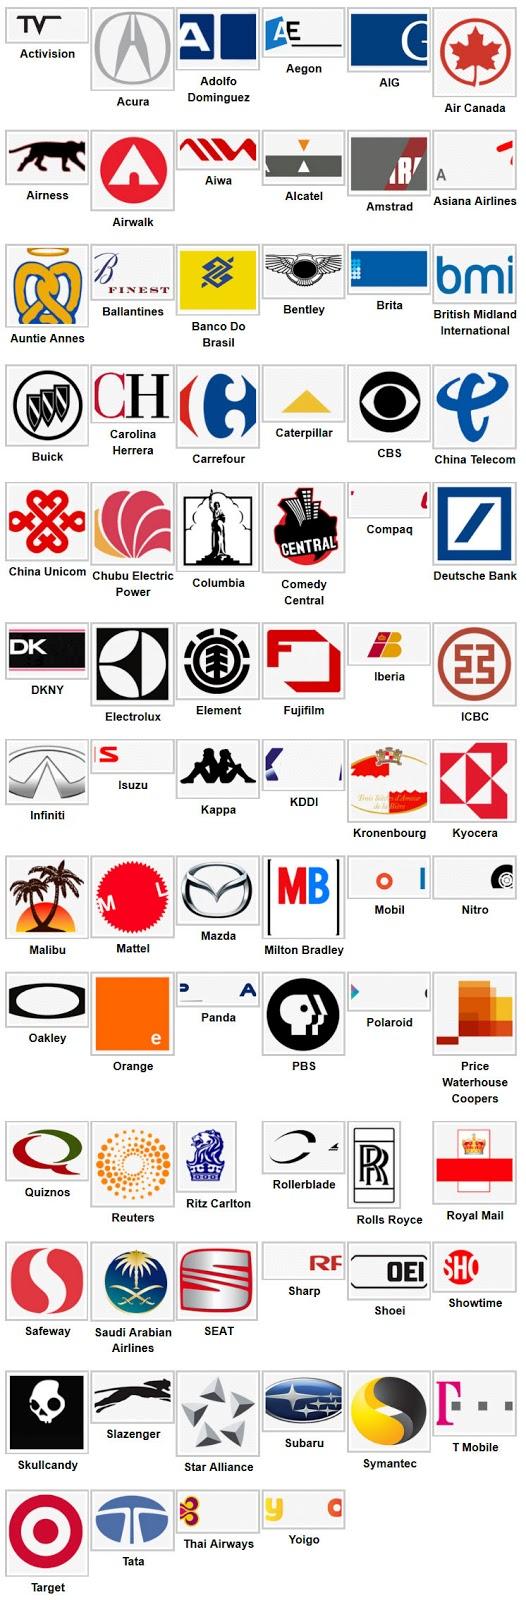 logo game answers pack 5 logo 33